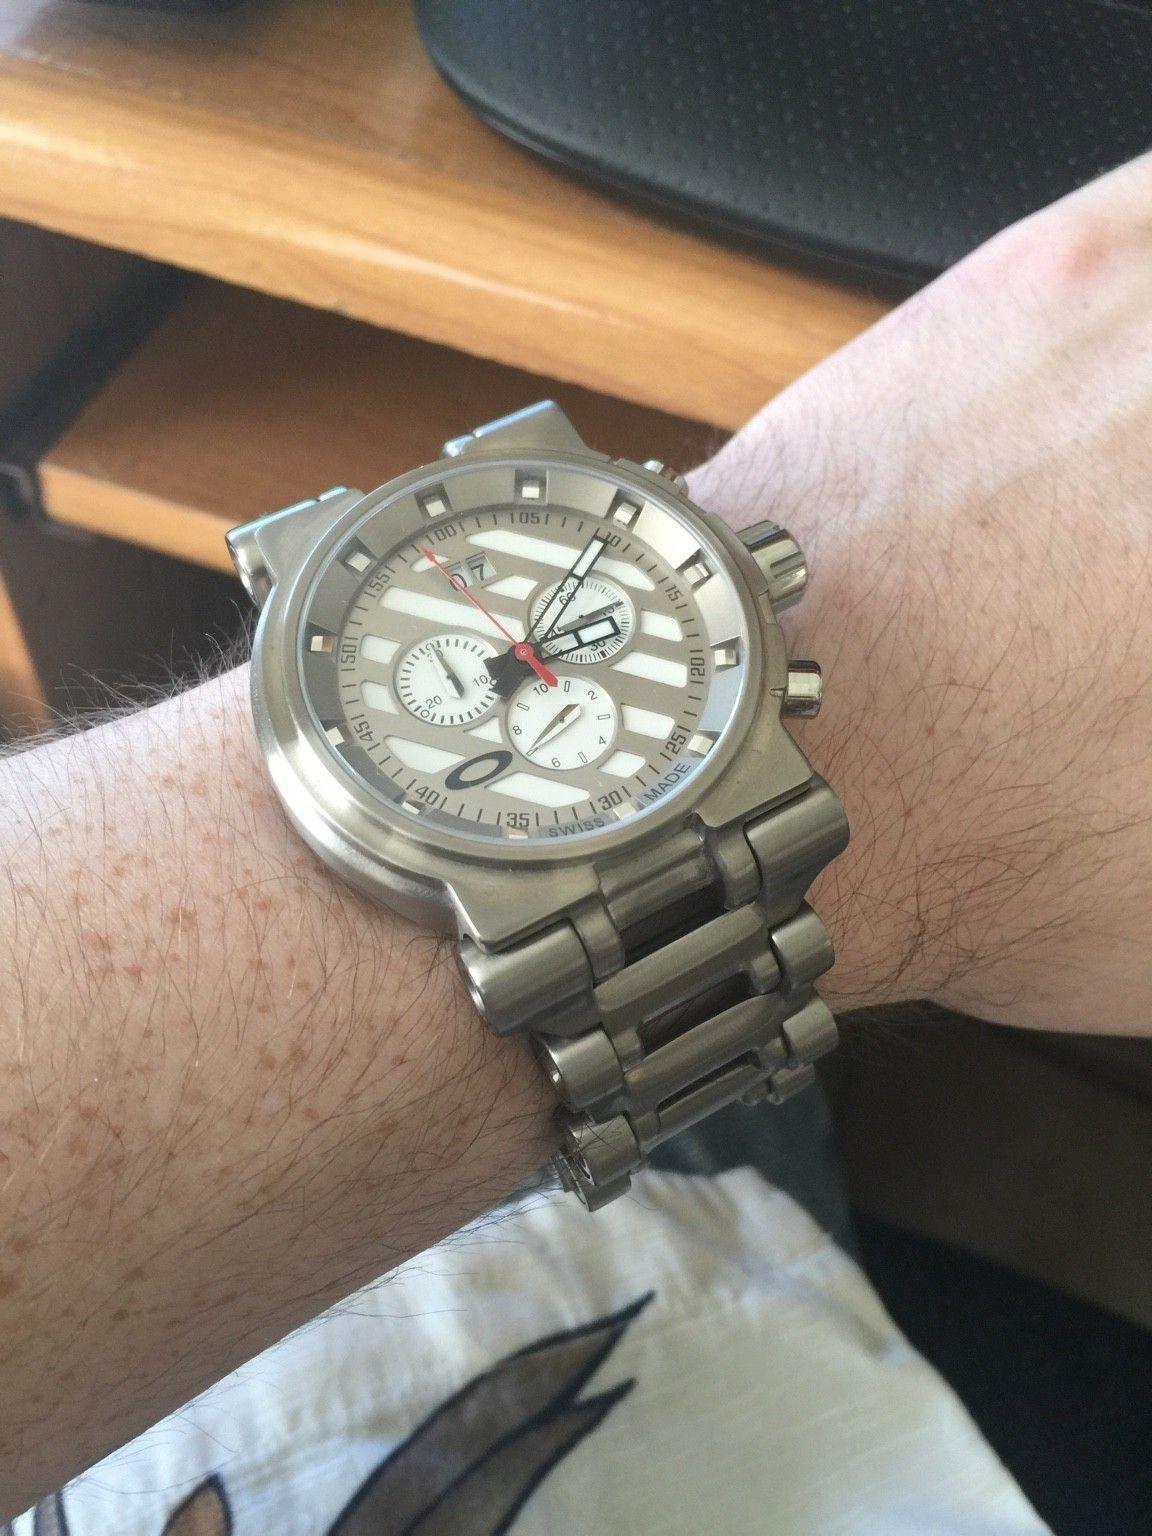 First Oakley Watch - ImageUploadedByTapatalk1446927018.084328.jpg